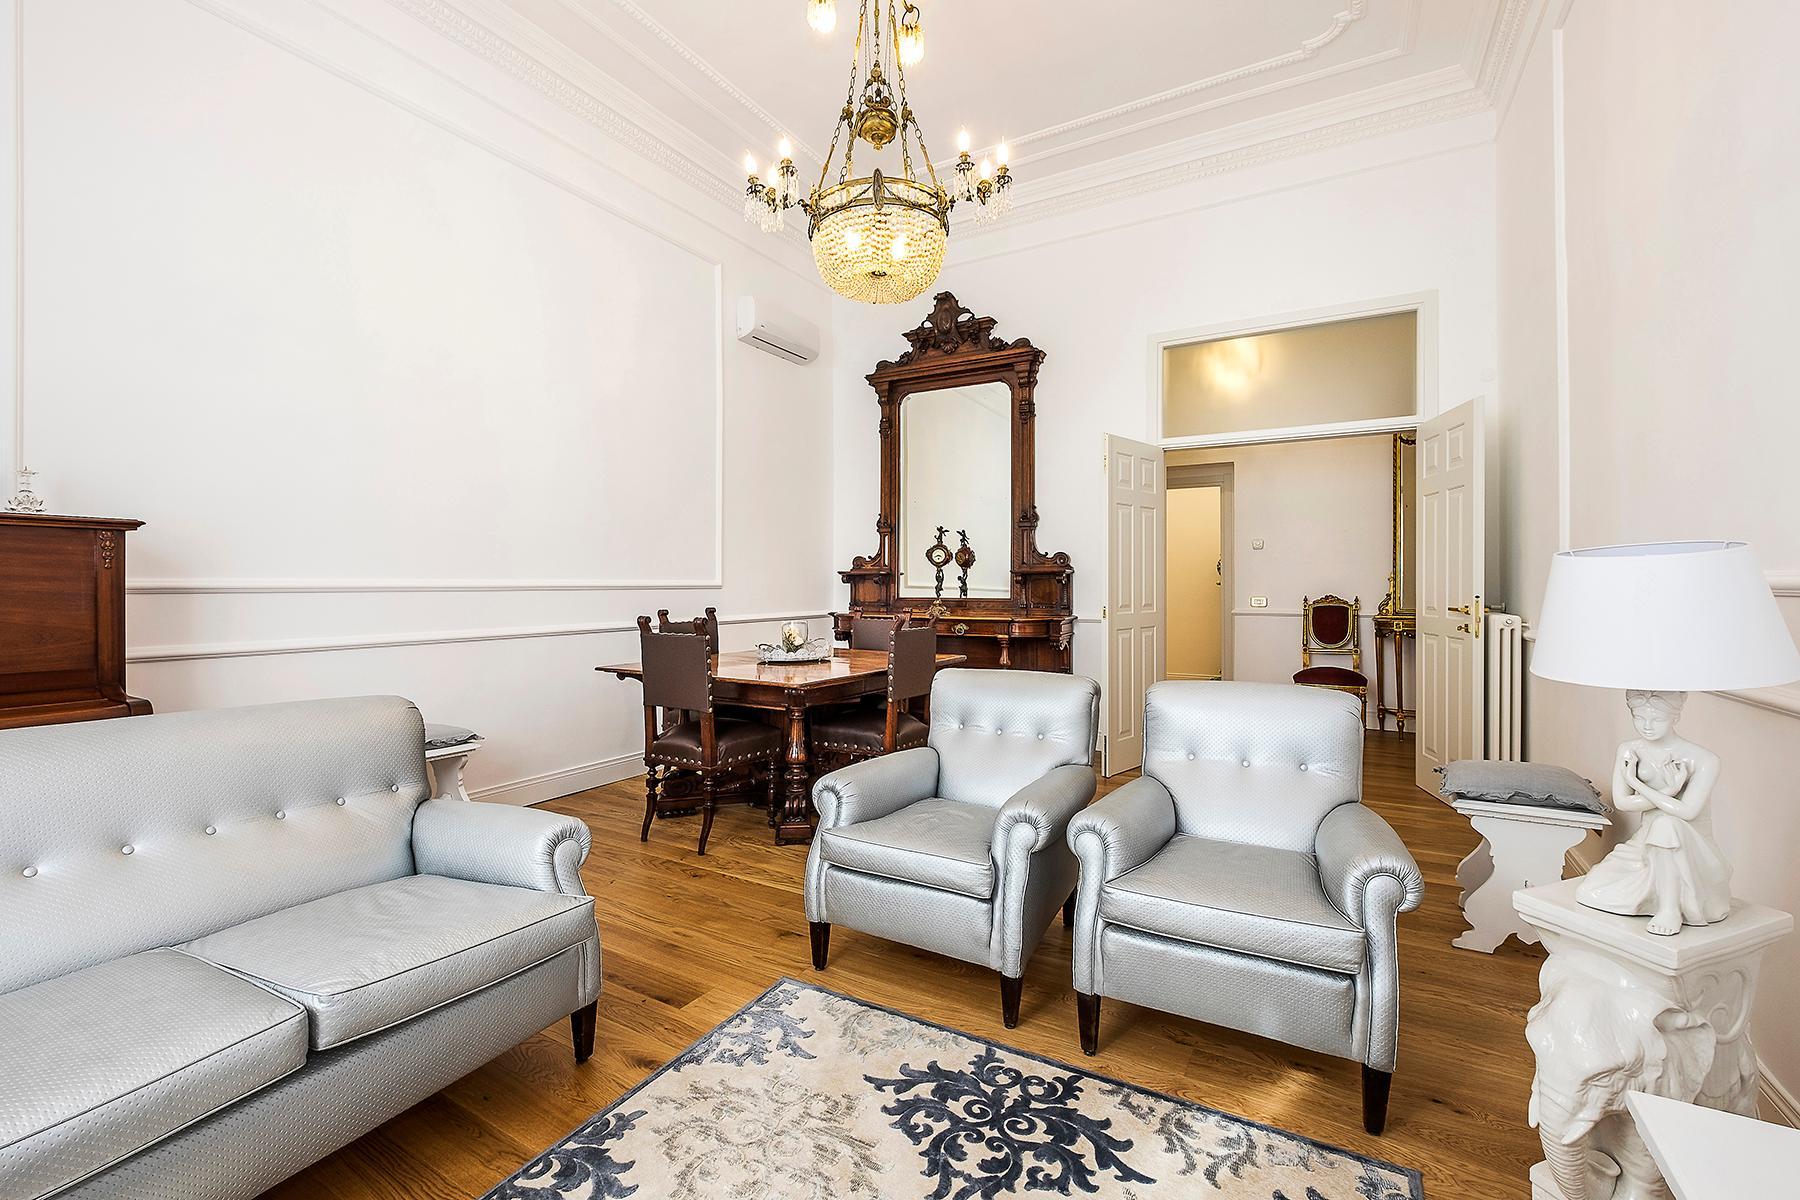 Elegante Wohnung auf dem Piazza dei Quiriti - 2